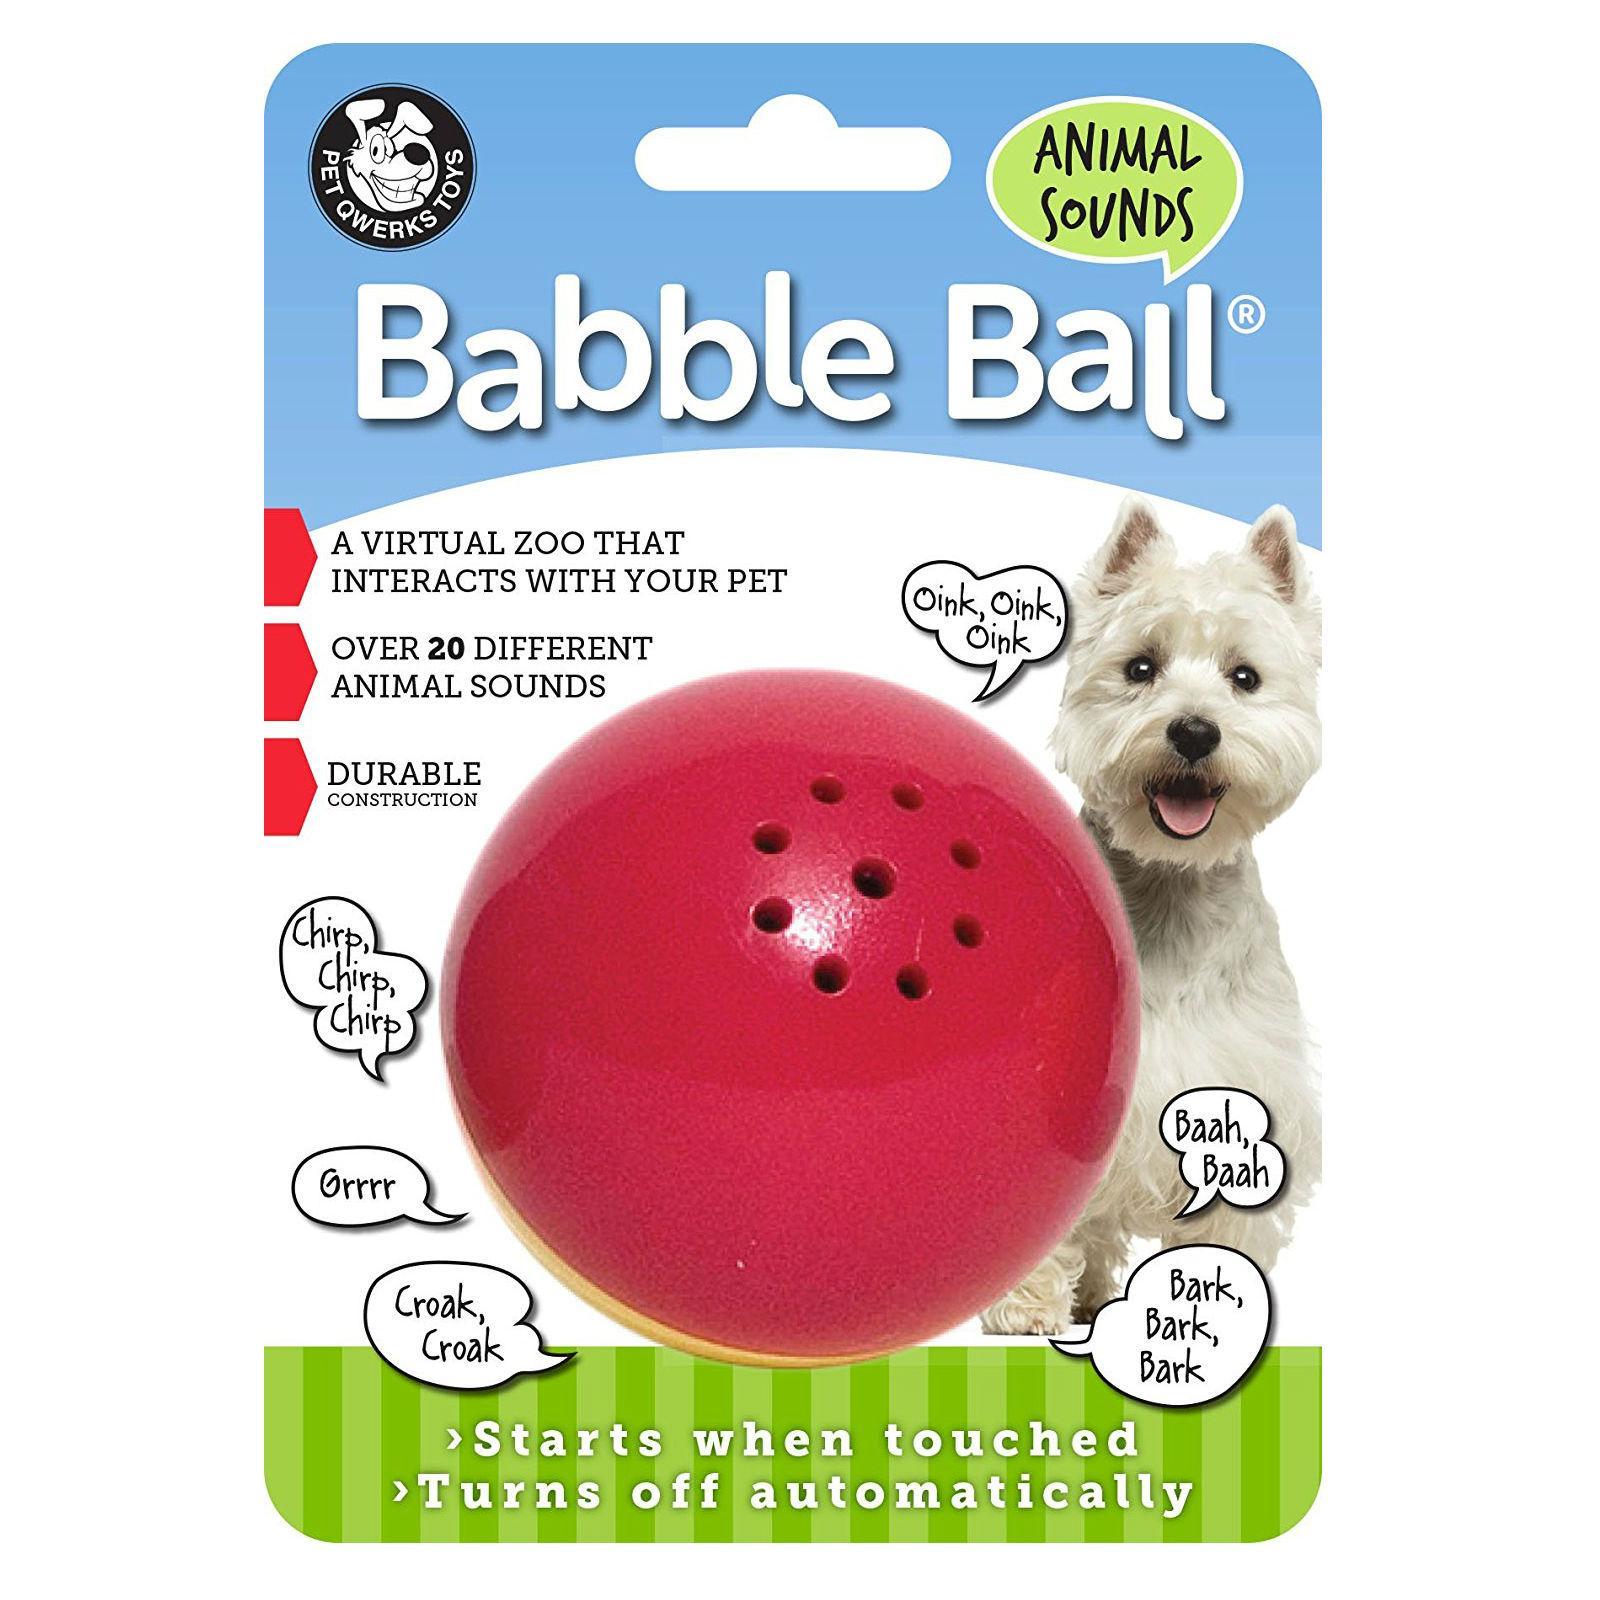 Pet Qwerks Animal Sounds Babble Ball Dog Toy